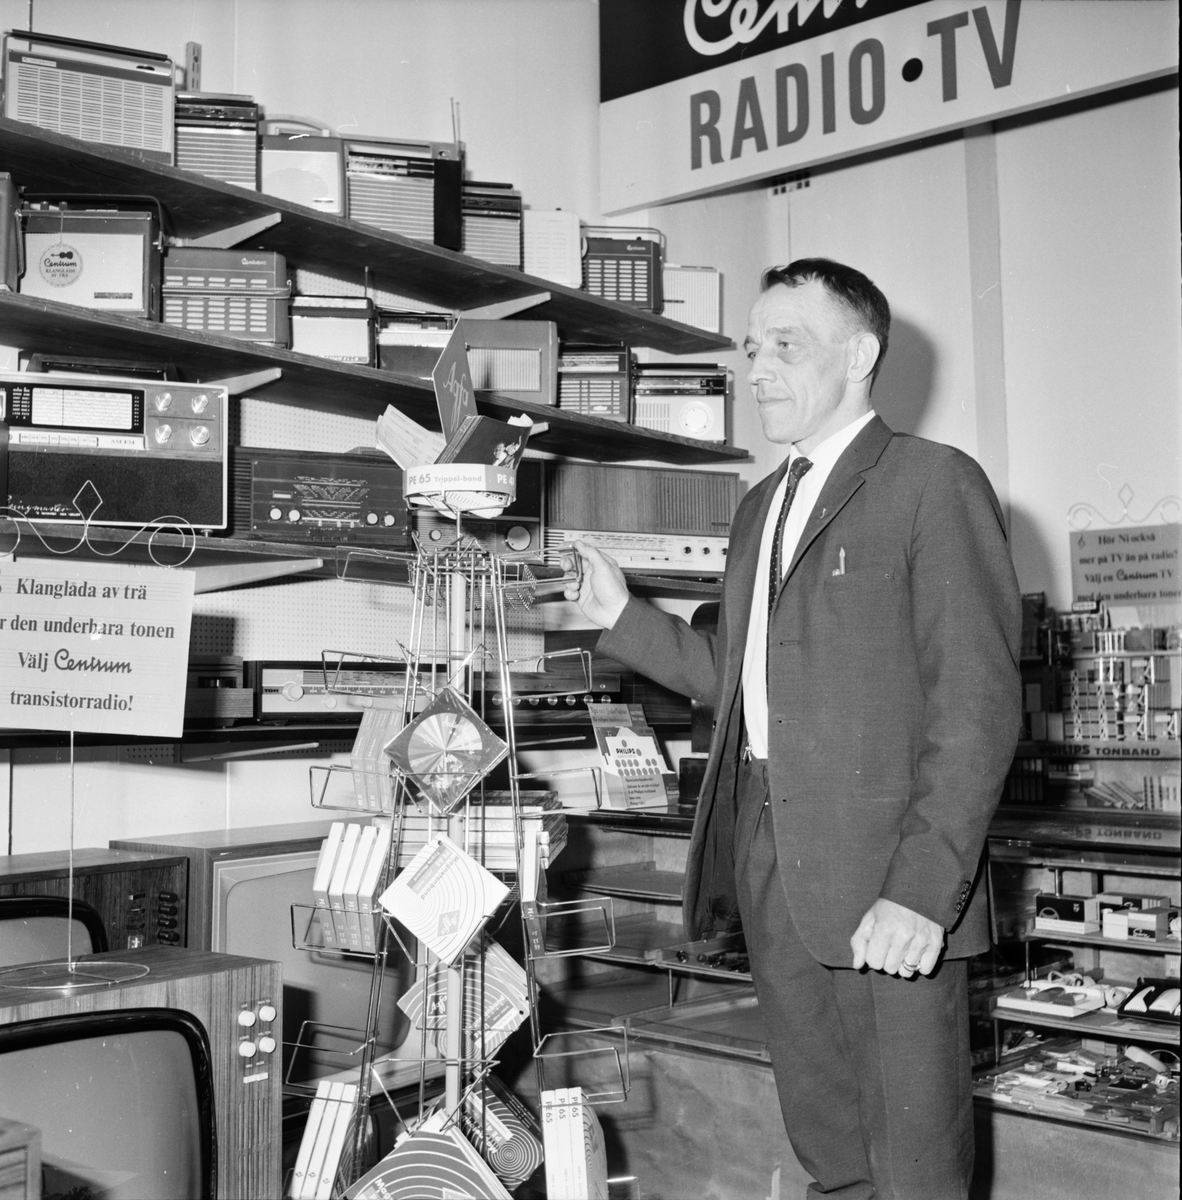 Thores Radio TV, 16 Maj 1966